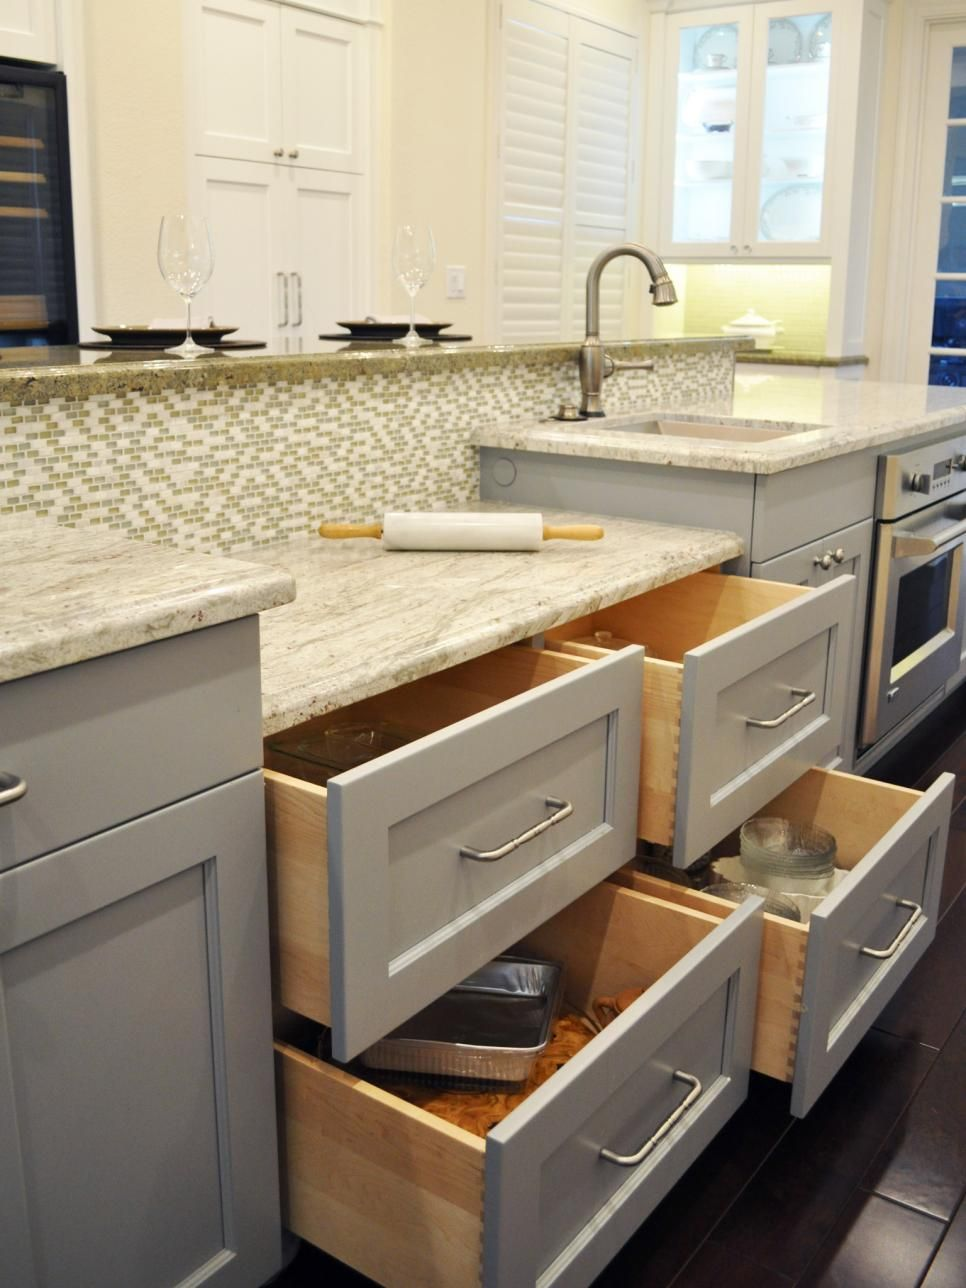 Eat In Kitchen With Baking Station Kitchen Baking